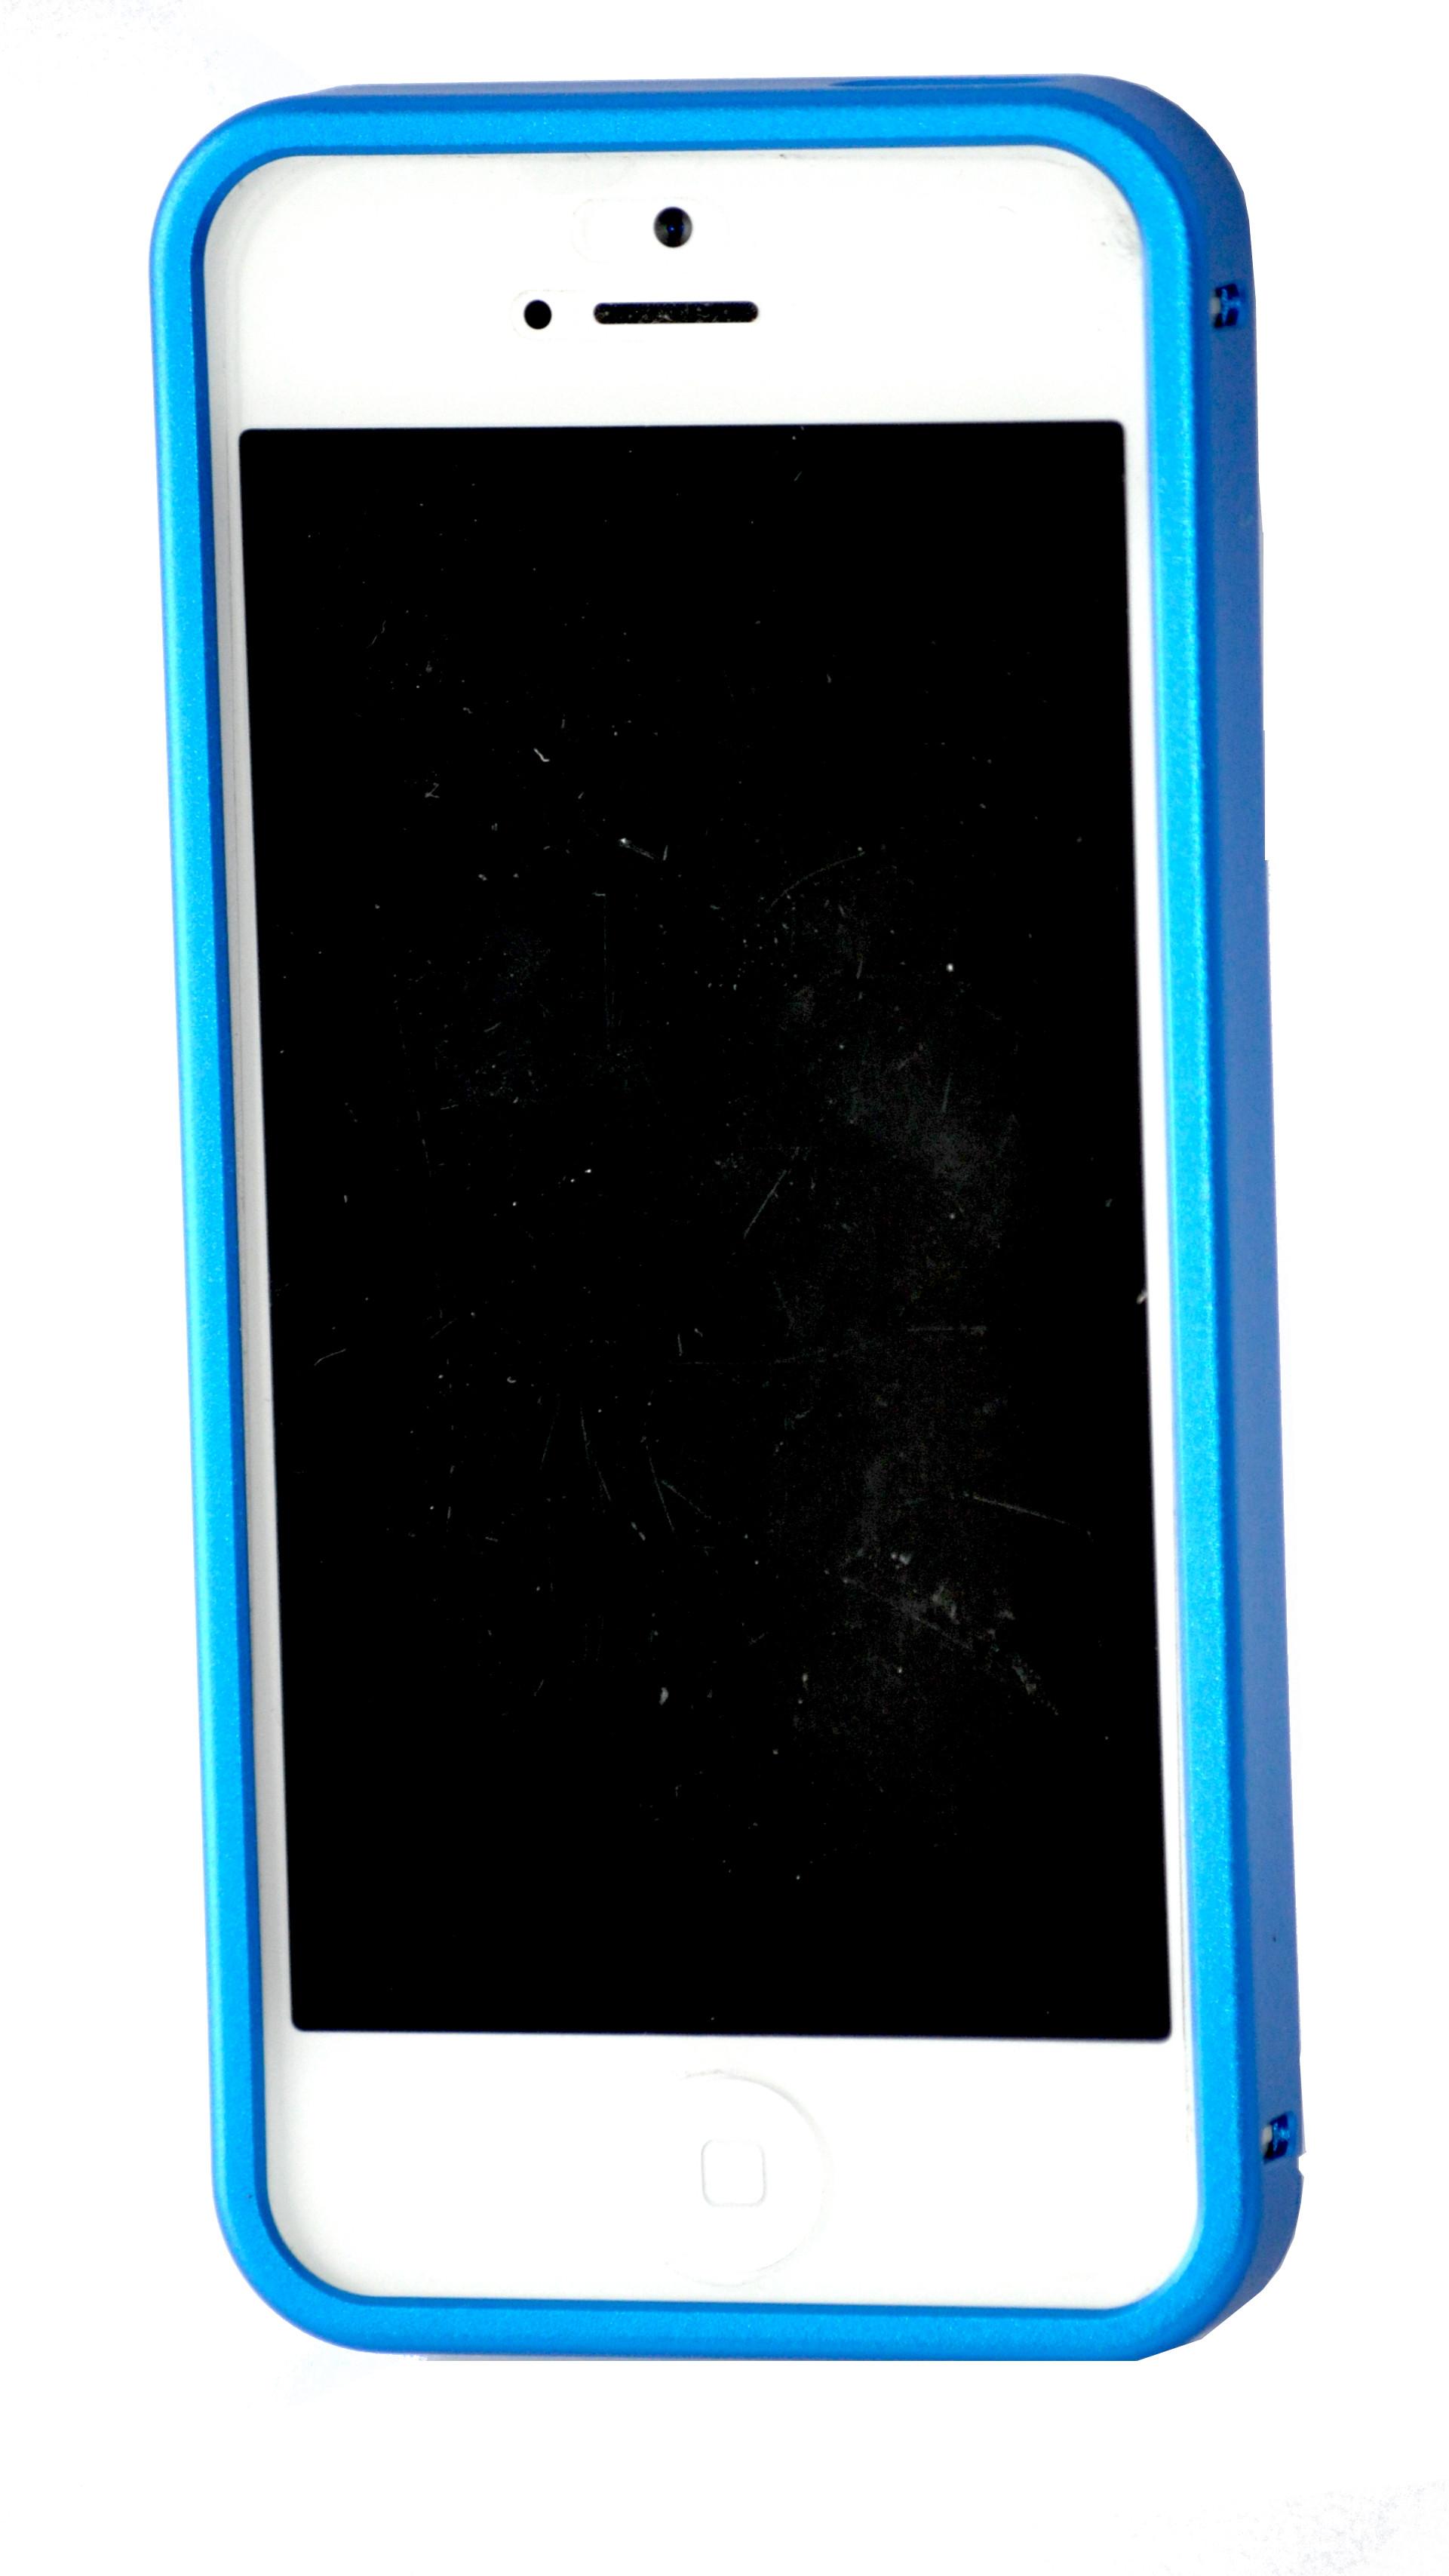 huge selection of 298fc d0cca Buy RL Idea Bumper Case for iPhone 5 / 5S Matte Blue @ ₹ 1798 by RL ...